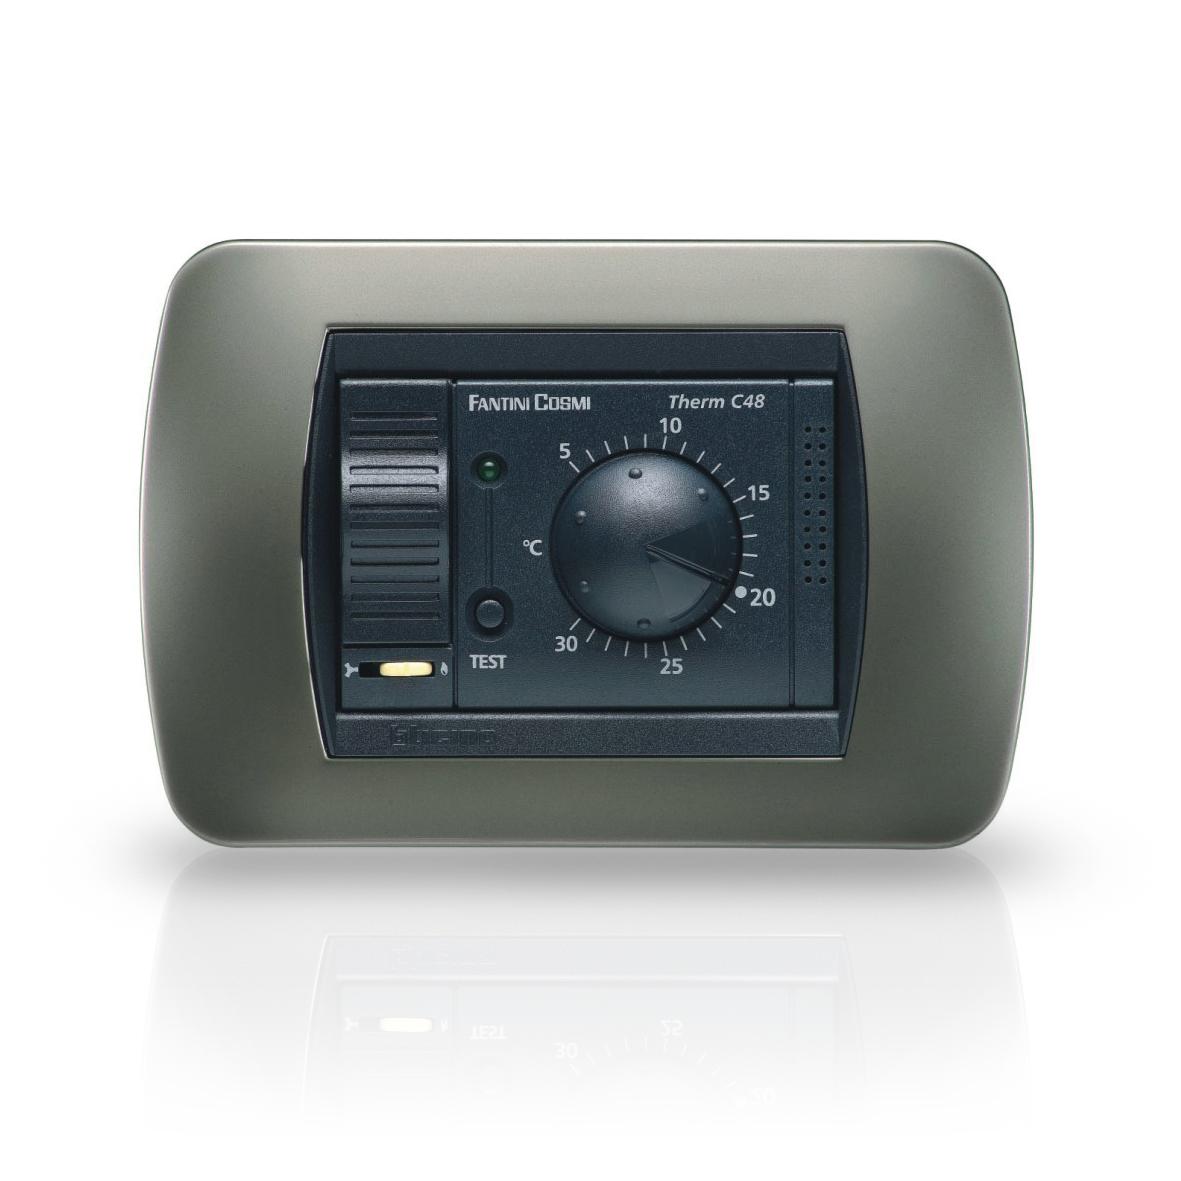 C48 Termostati Ambiente Da Incasso A Batterie A 1 Temperatura